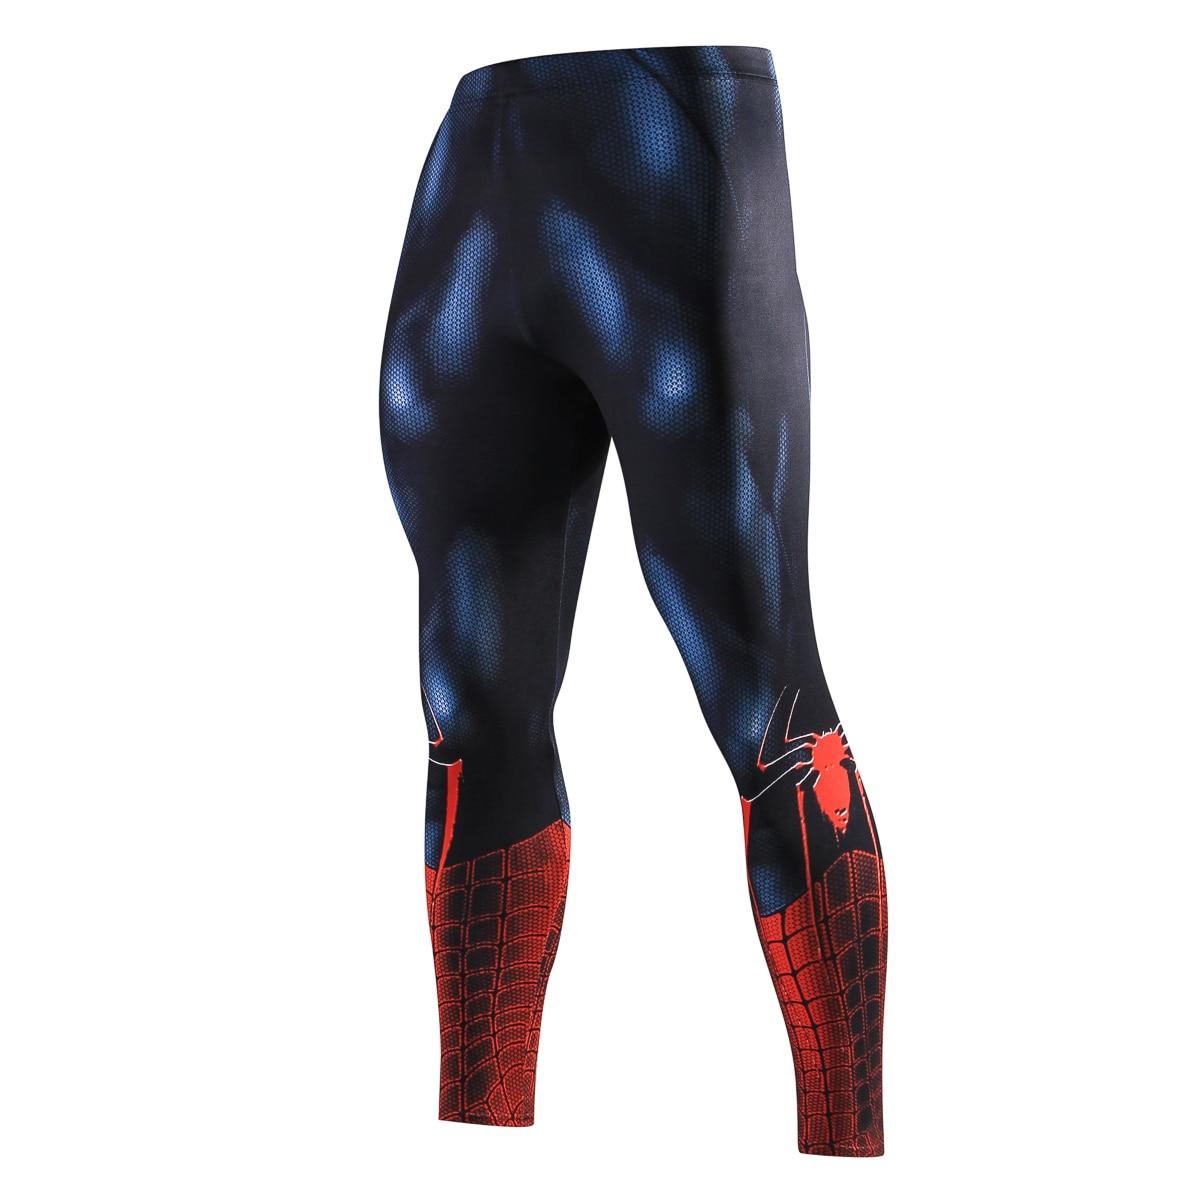 Men Skinny Compression Pants Superman Spiderman Iron Man Batman Leggings Sweatpants 3D Fitness Bodybuilding Elastic Trousers стульчик для кормления bloom fresco chrome giro